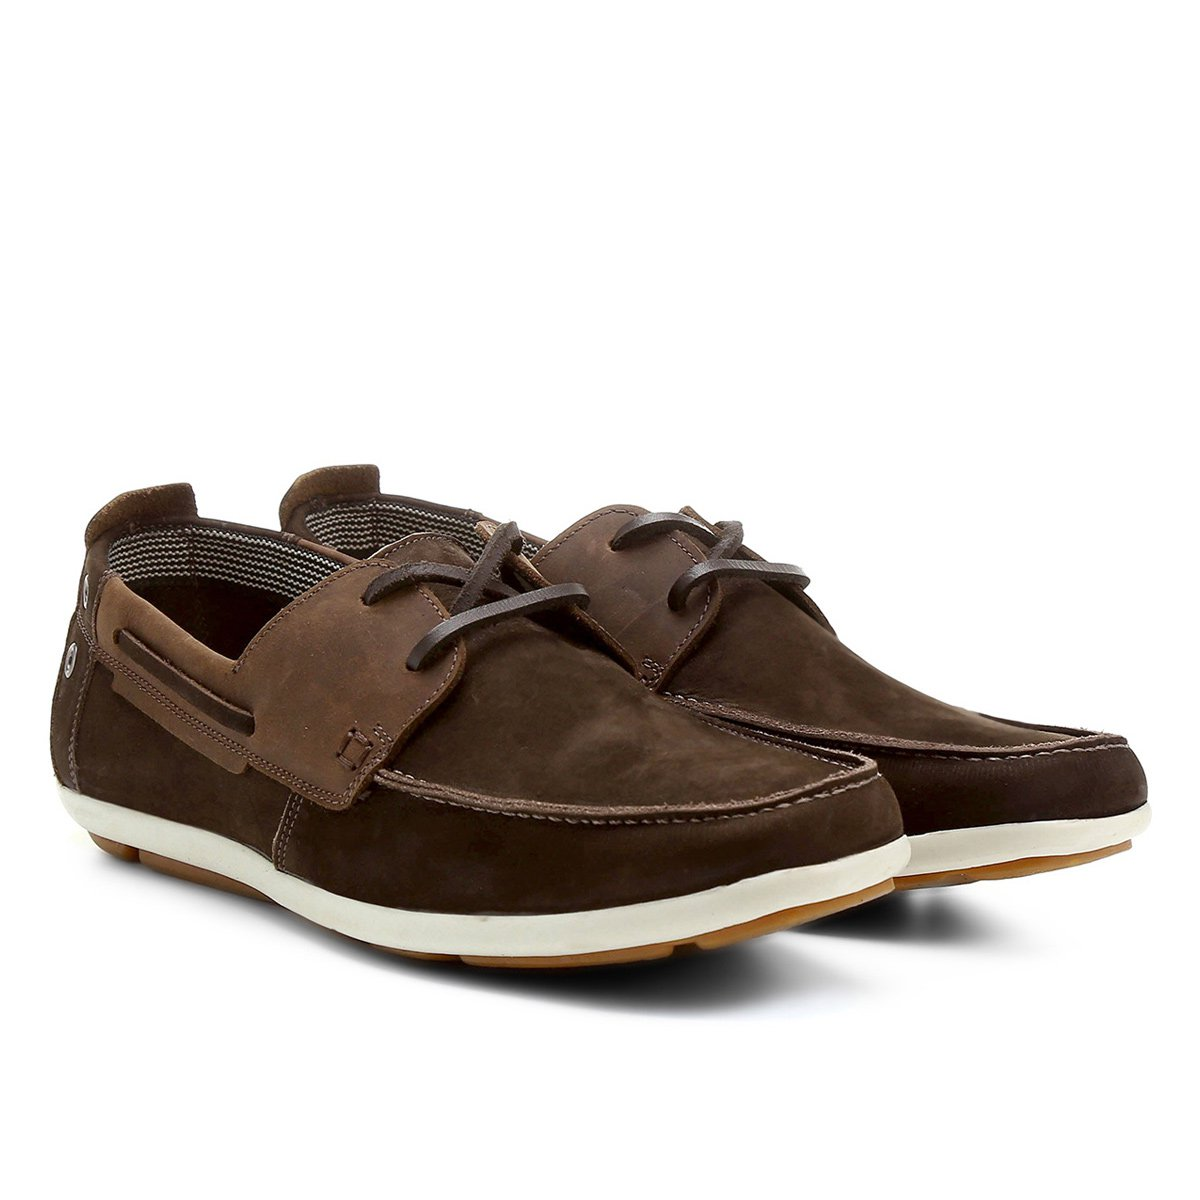 e82c70fcf Sider Couro Shoestock Nobuck Masculino - Café | Shoestock